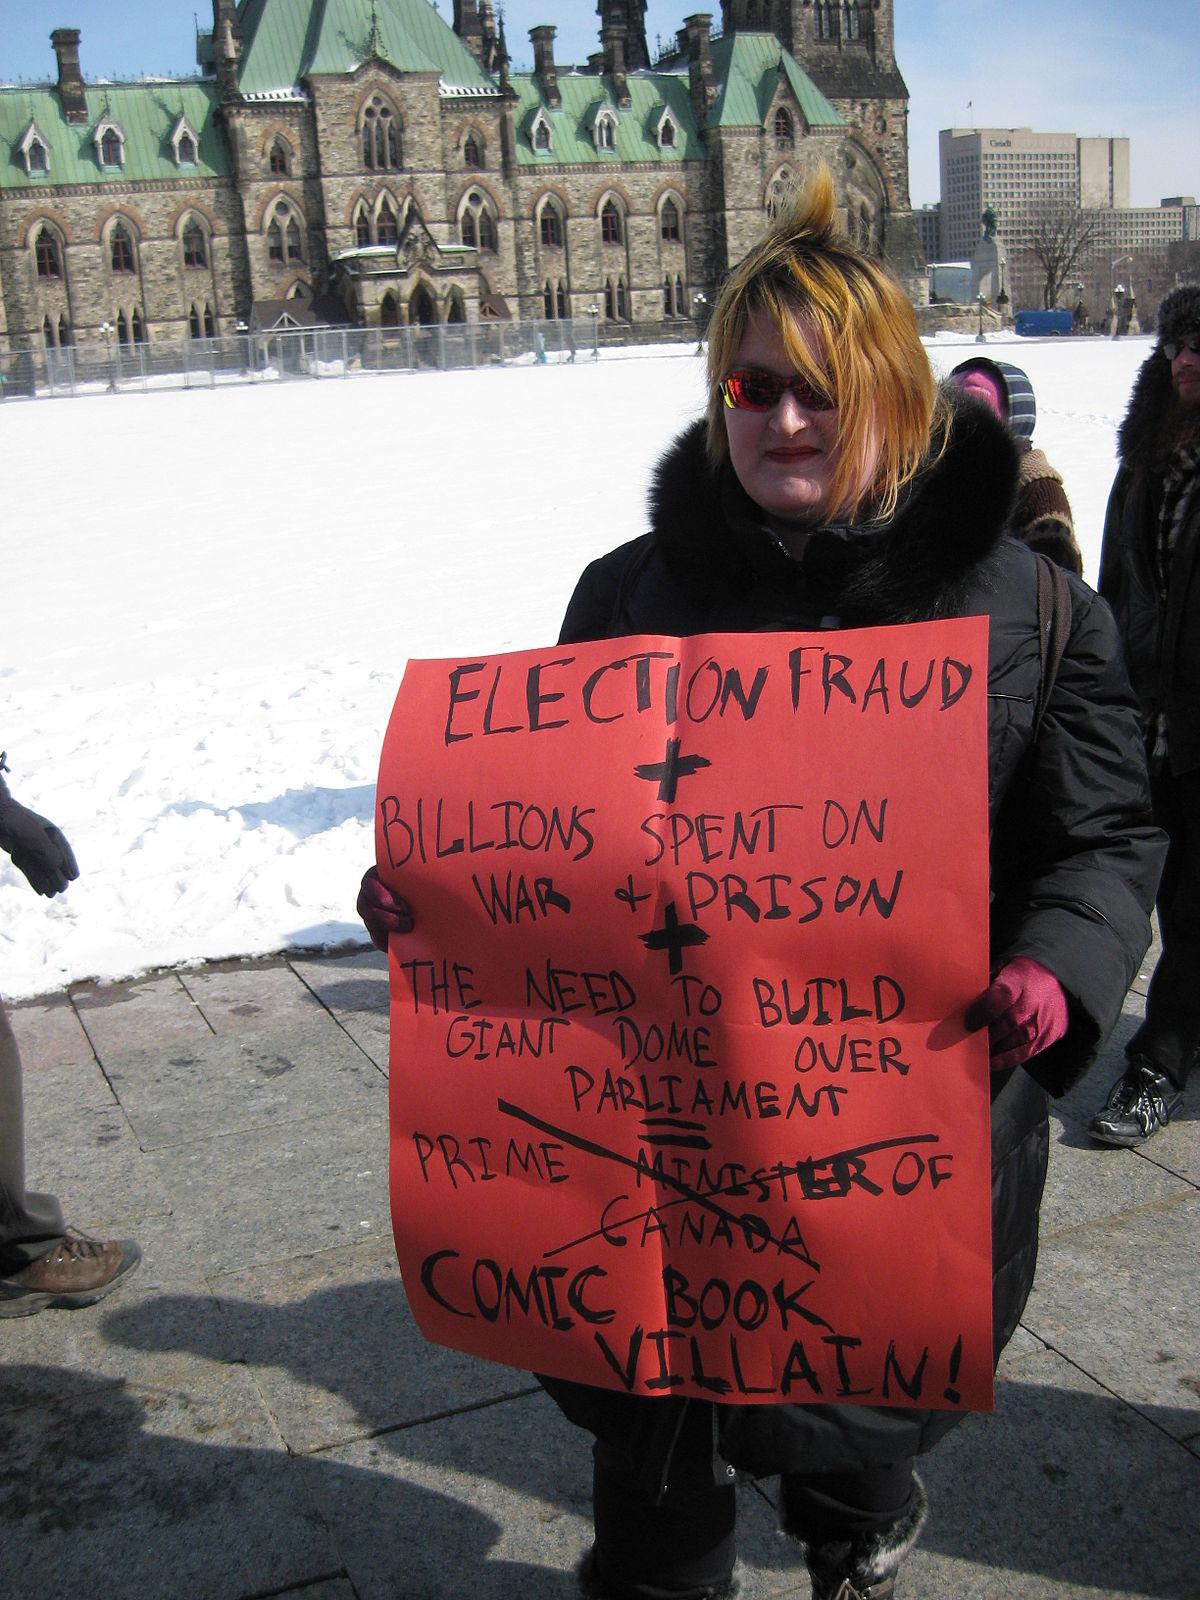 2011 Canadian federal election voter suppression scandal